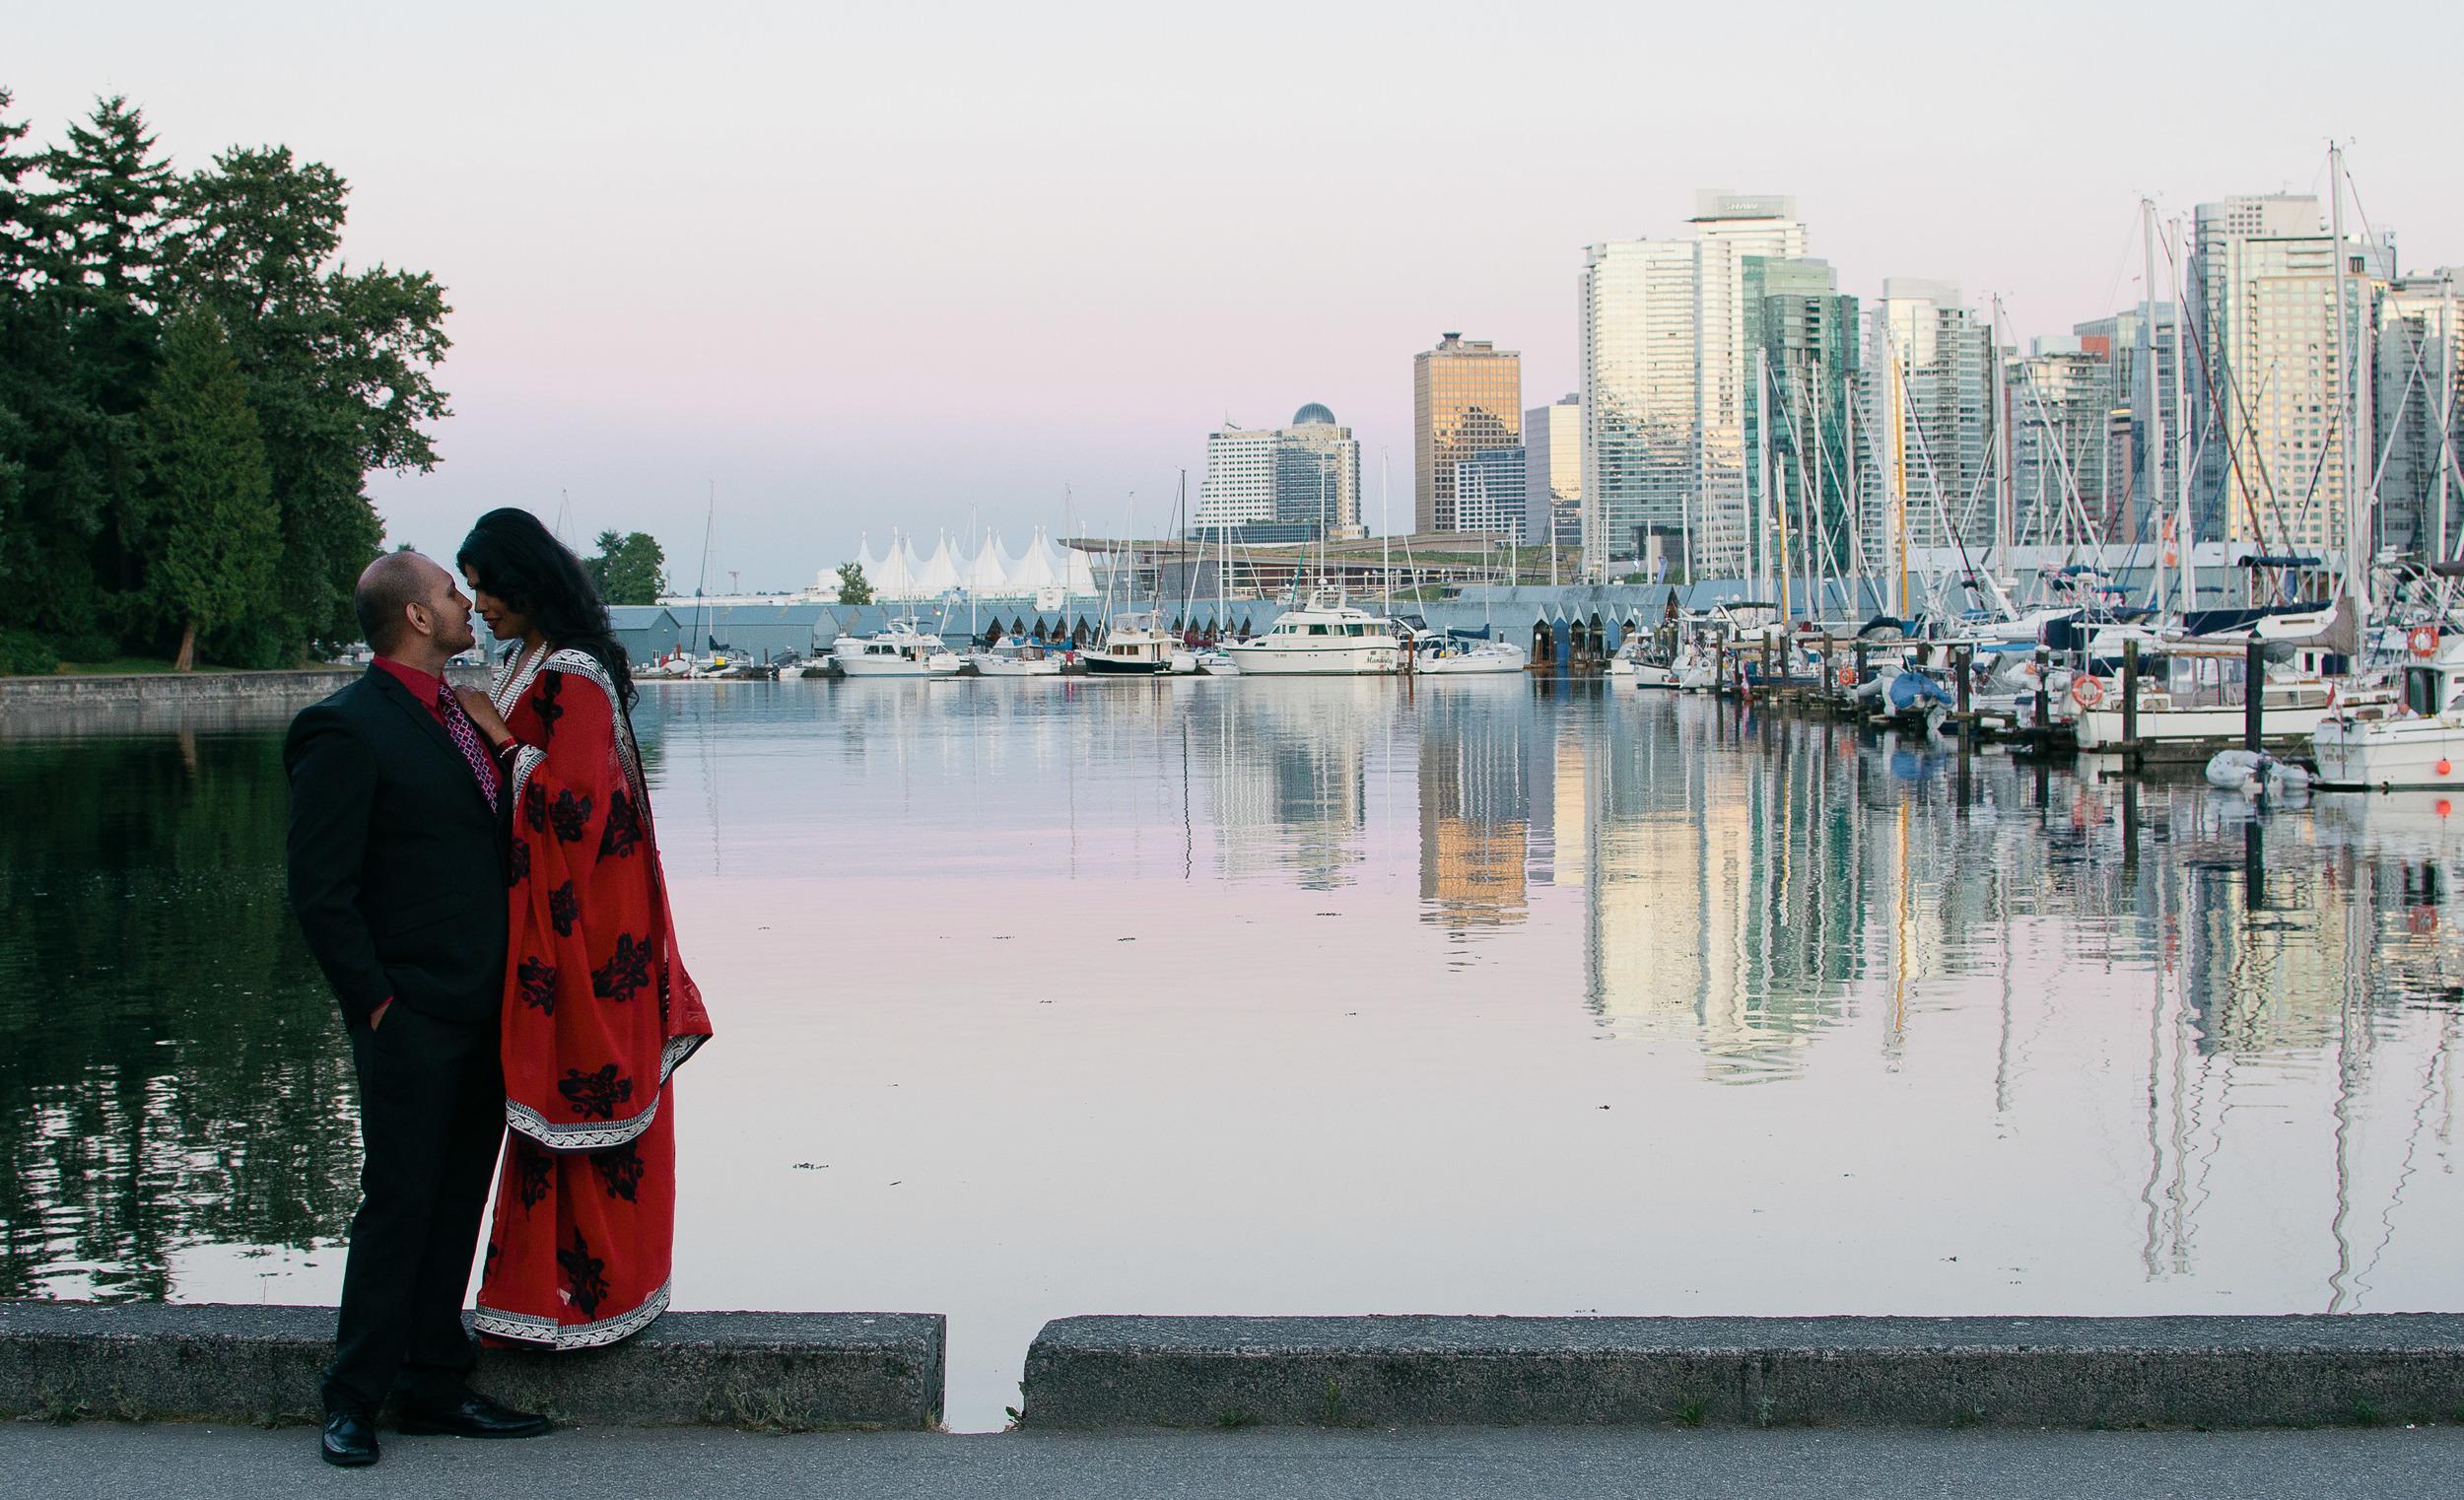 Amresh + Salona_Katie Powell Photography Vancouver Engagement Stanley Park Portraits-19.jpg